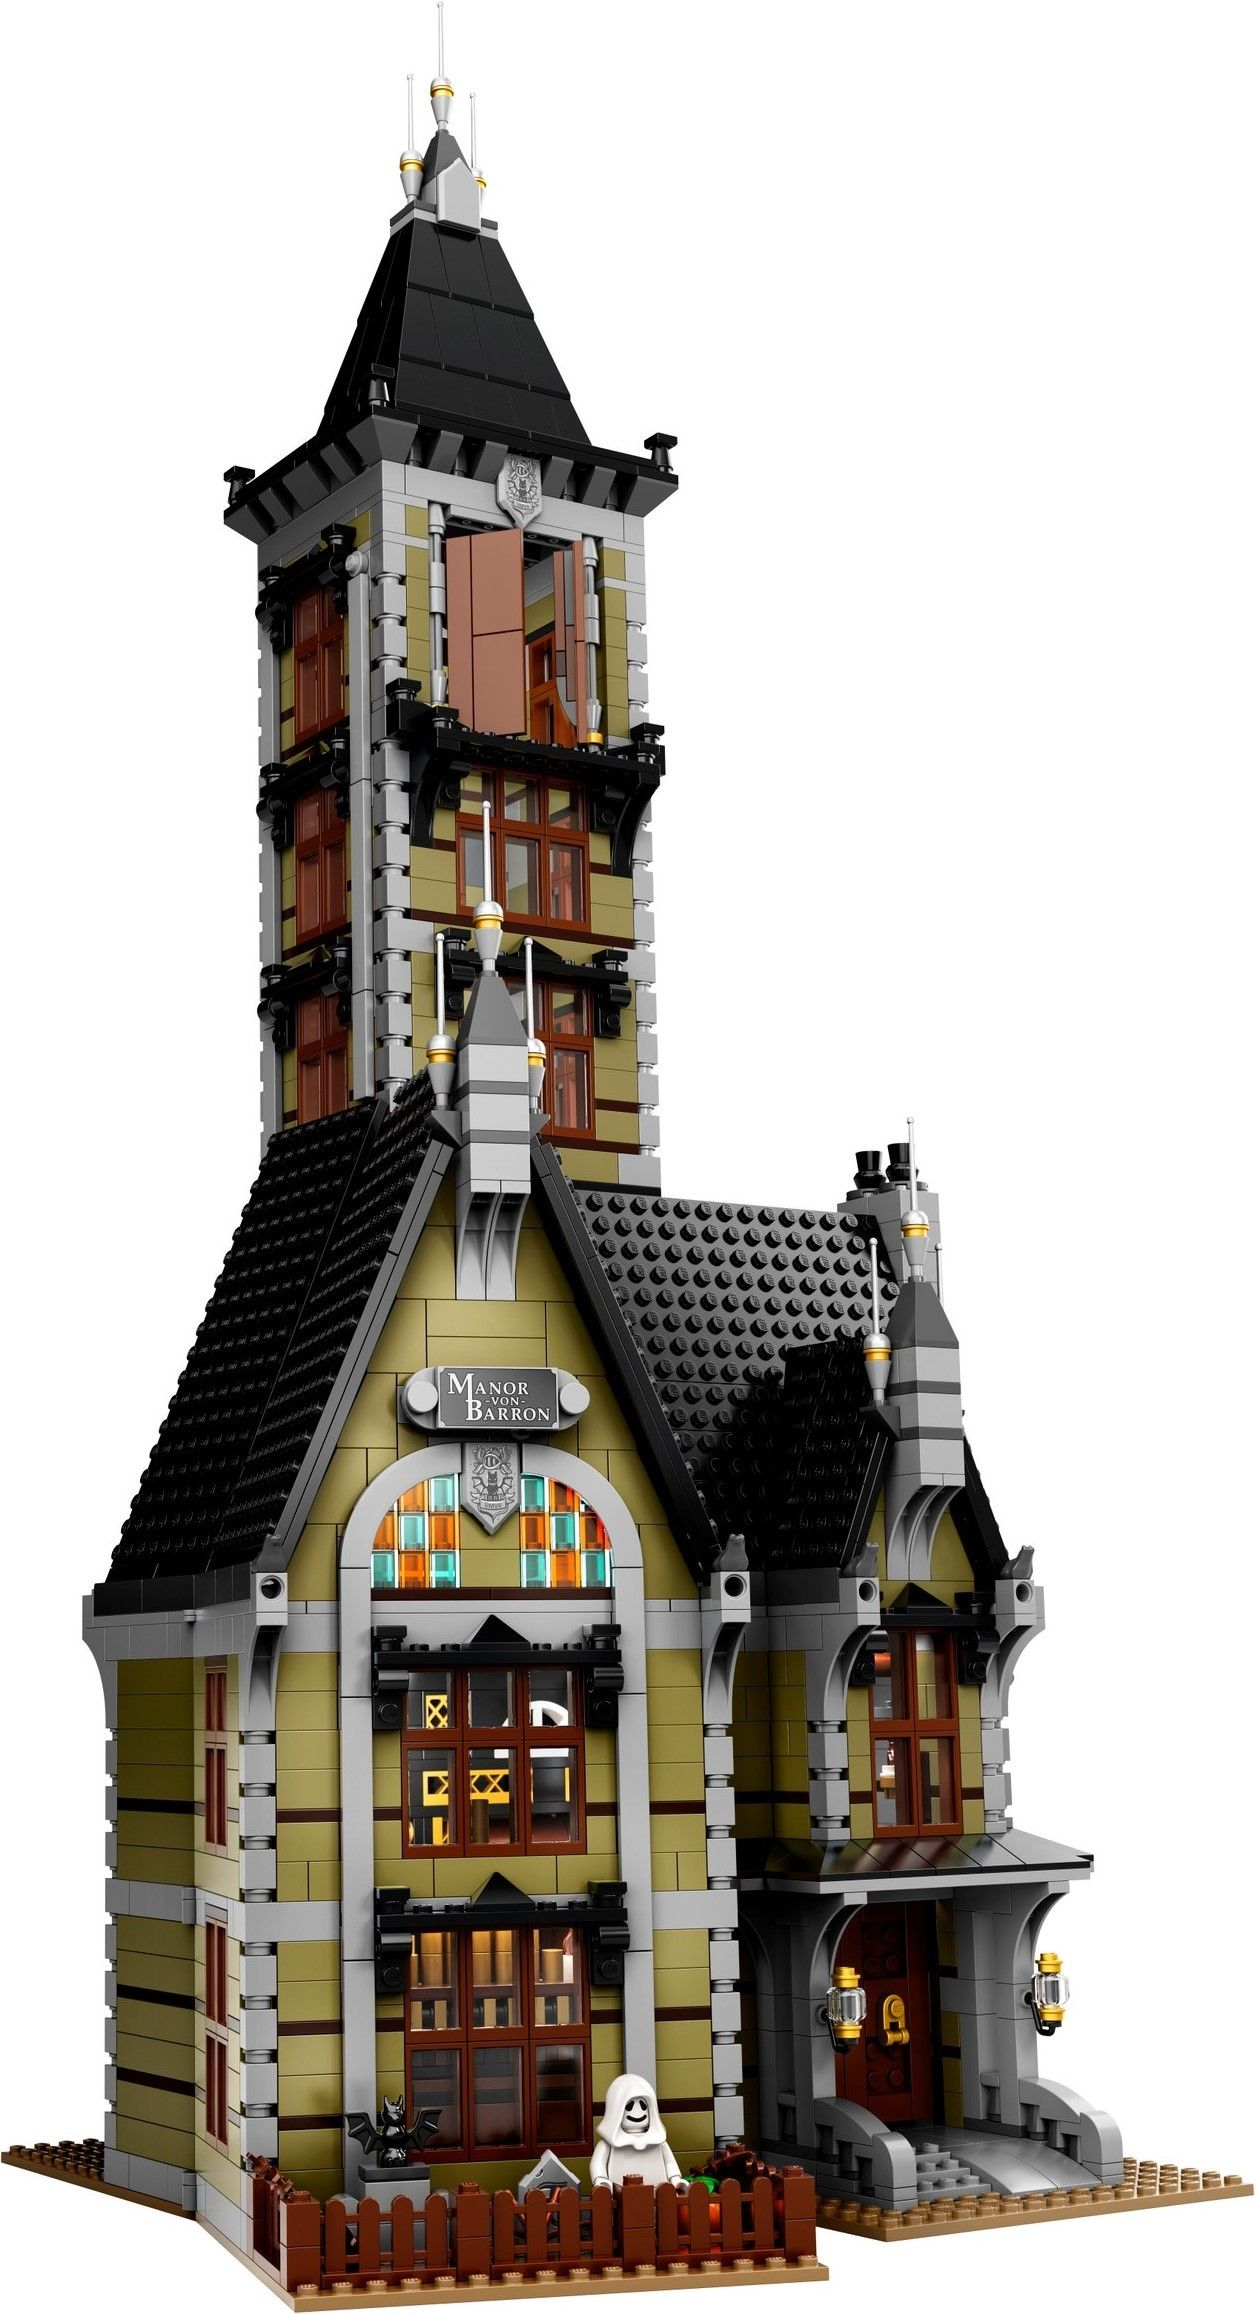 Lego 10273 Haunted House In 2020 Lego Haunted House Brick Loft Horror House